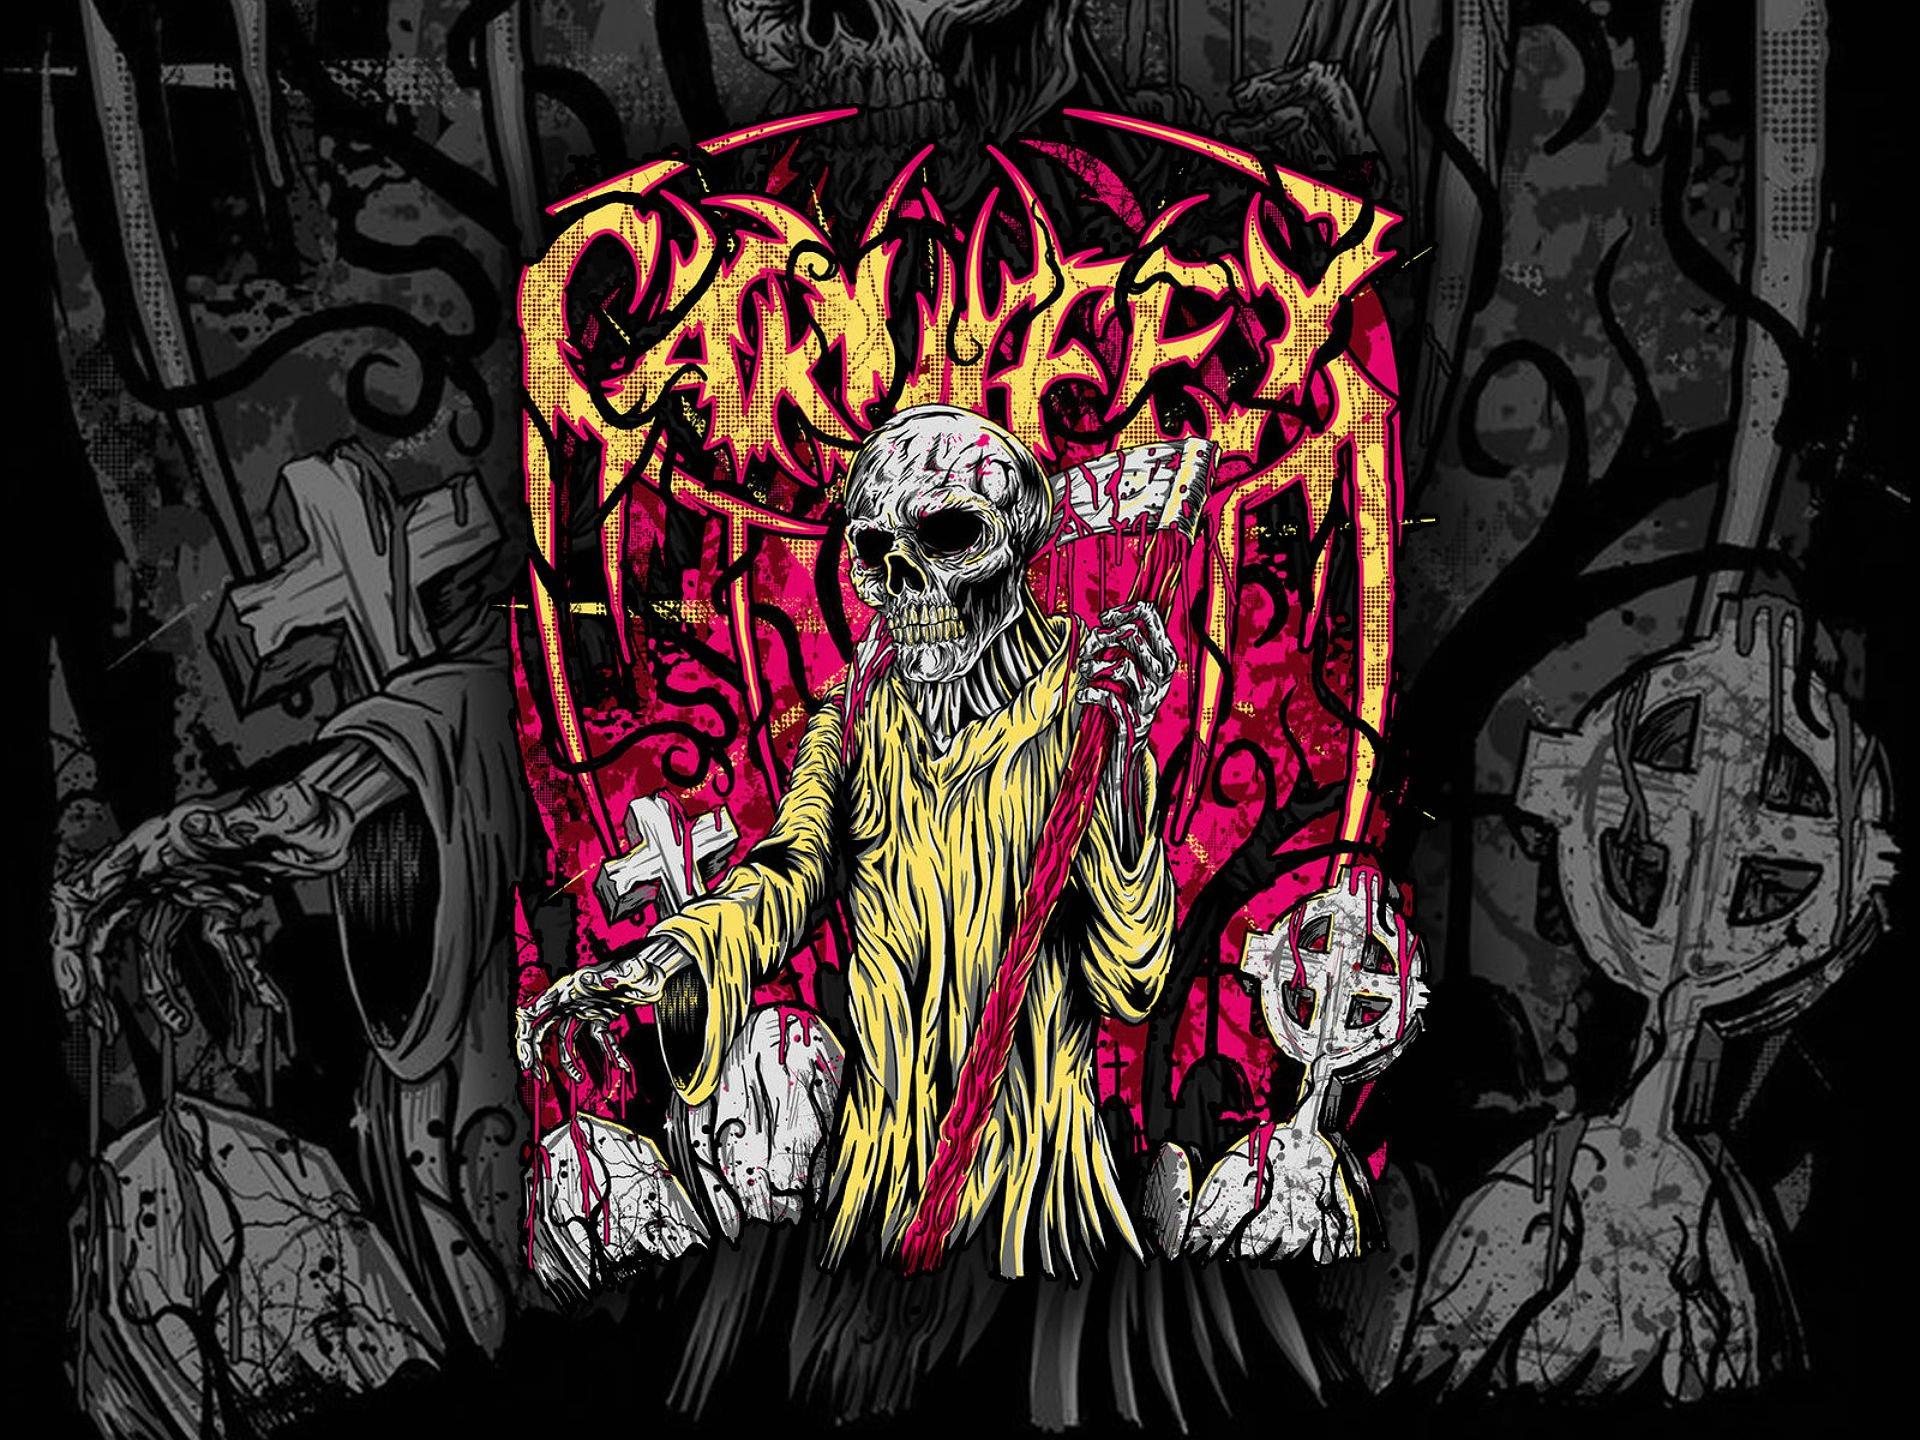 1920x1440 px 1carn carnifex dark death deathcore evil heavy metal poster reaper skull symphonic